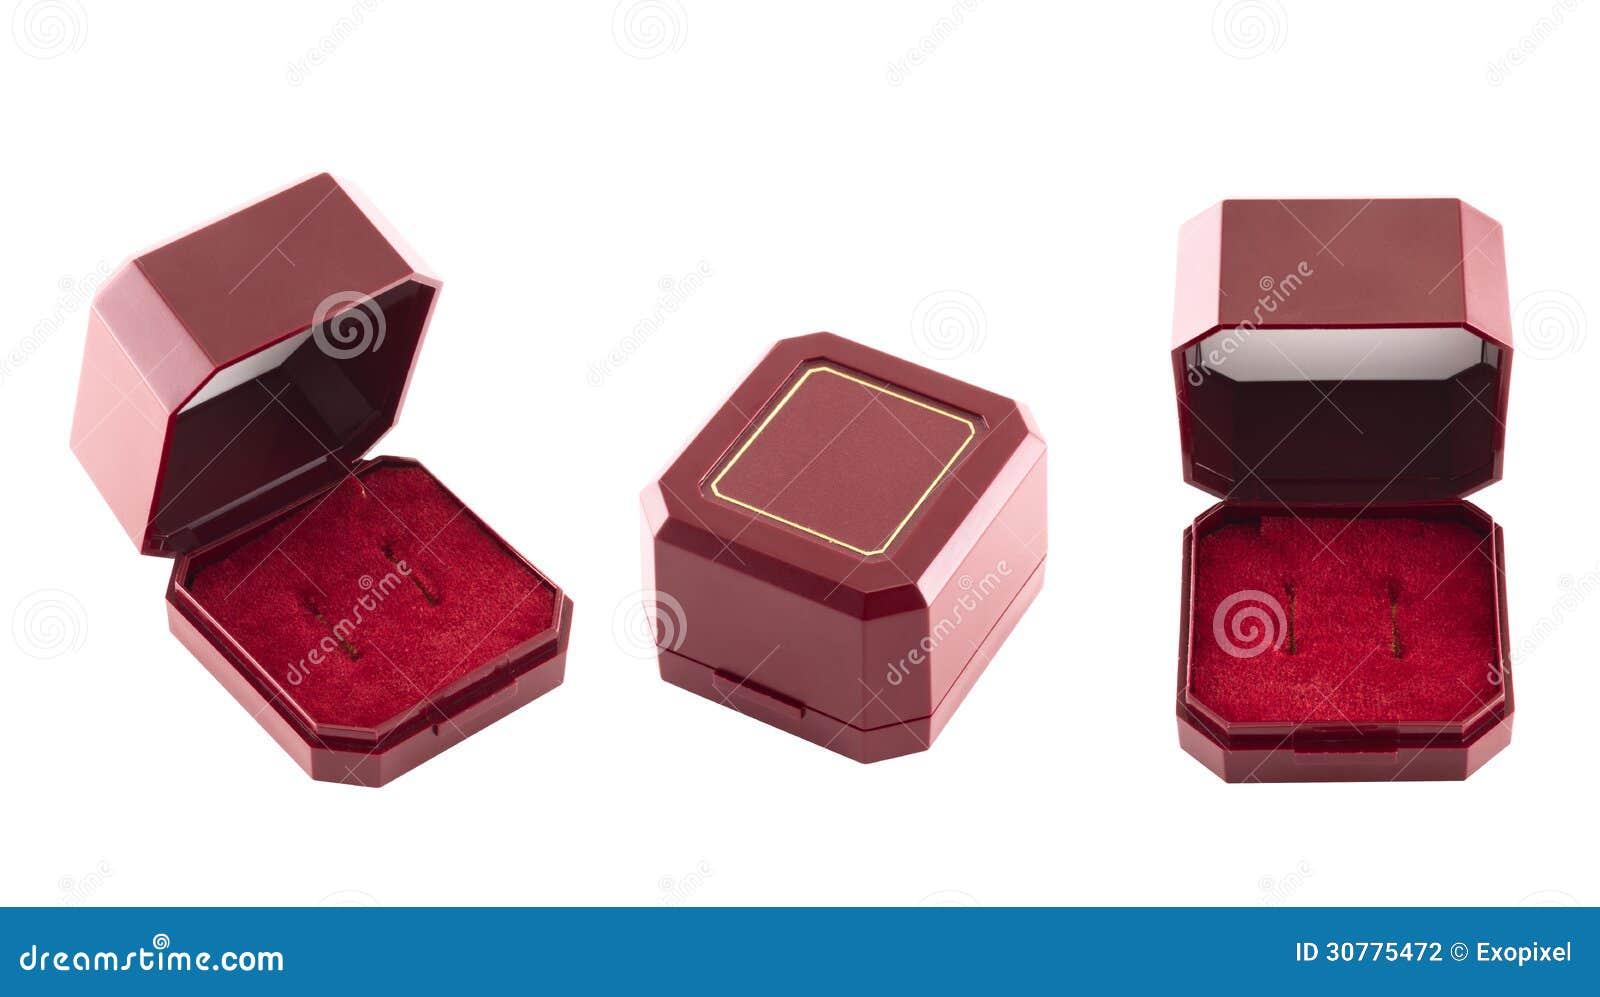 Jewelry red velvet gift box isolated stock photography for Red velvet jewelry gift boxes